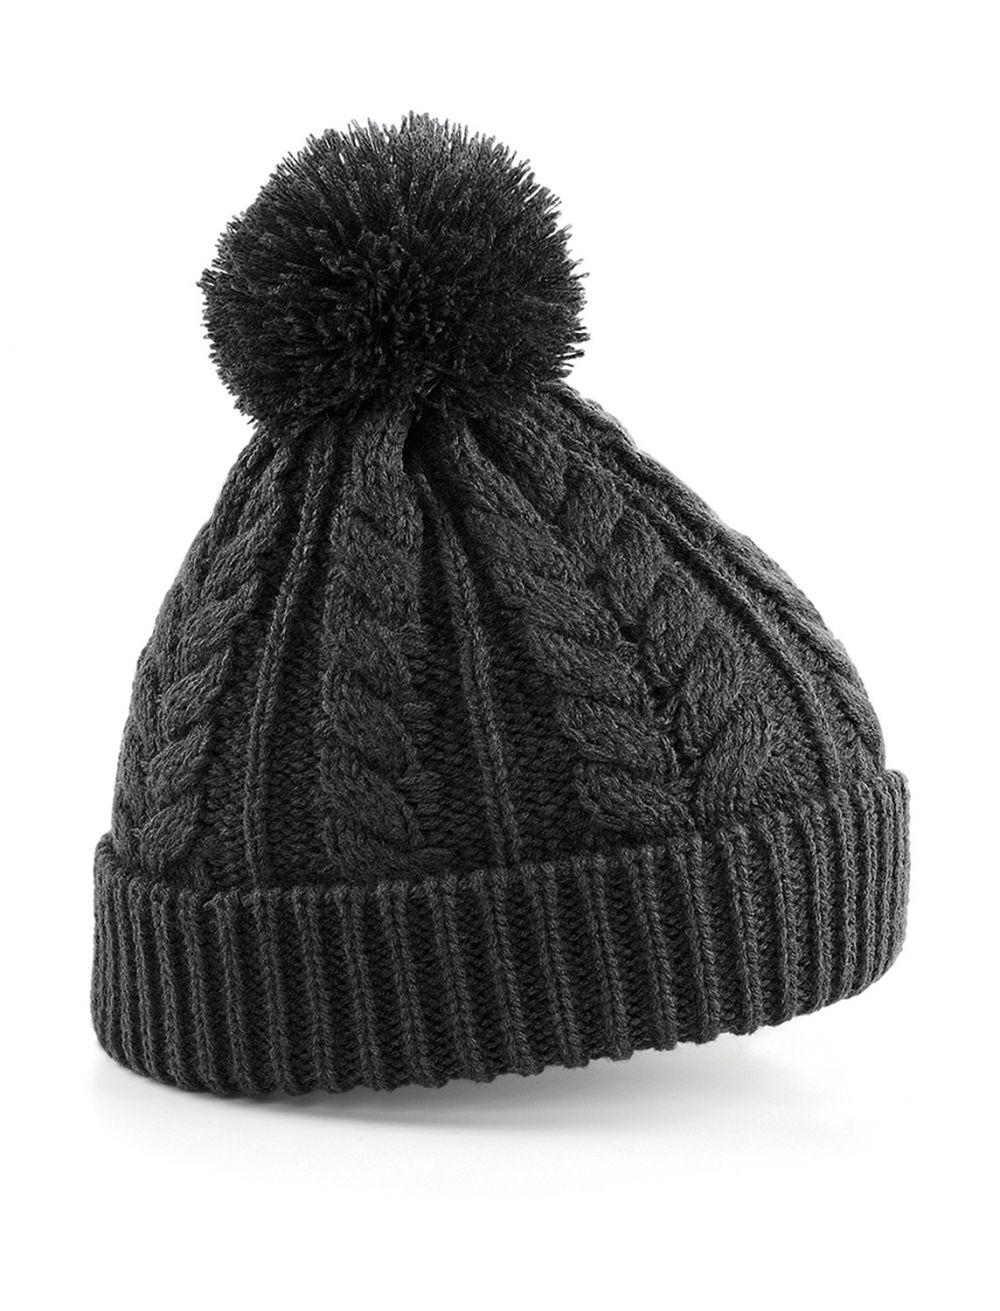 Gorros invierno beechfield snowstar de punto con logo imagen 1